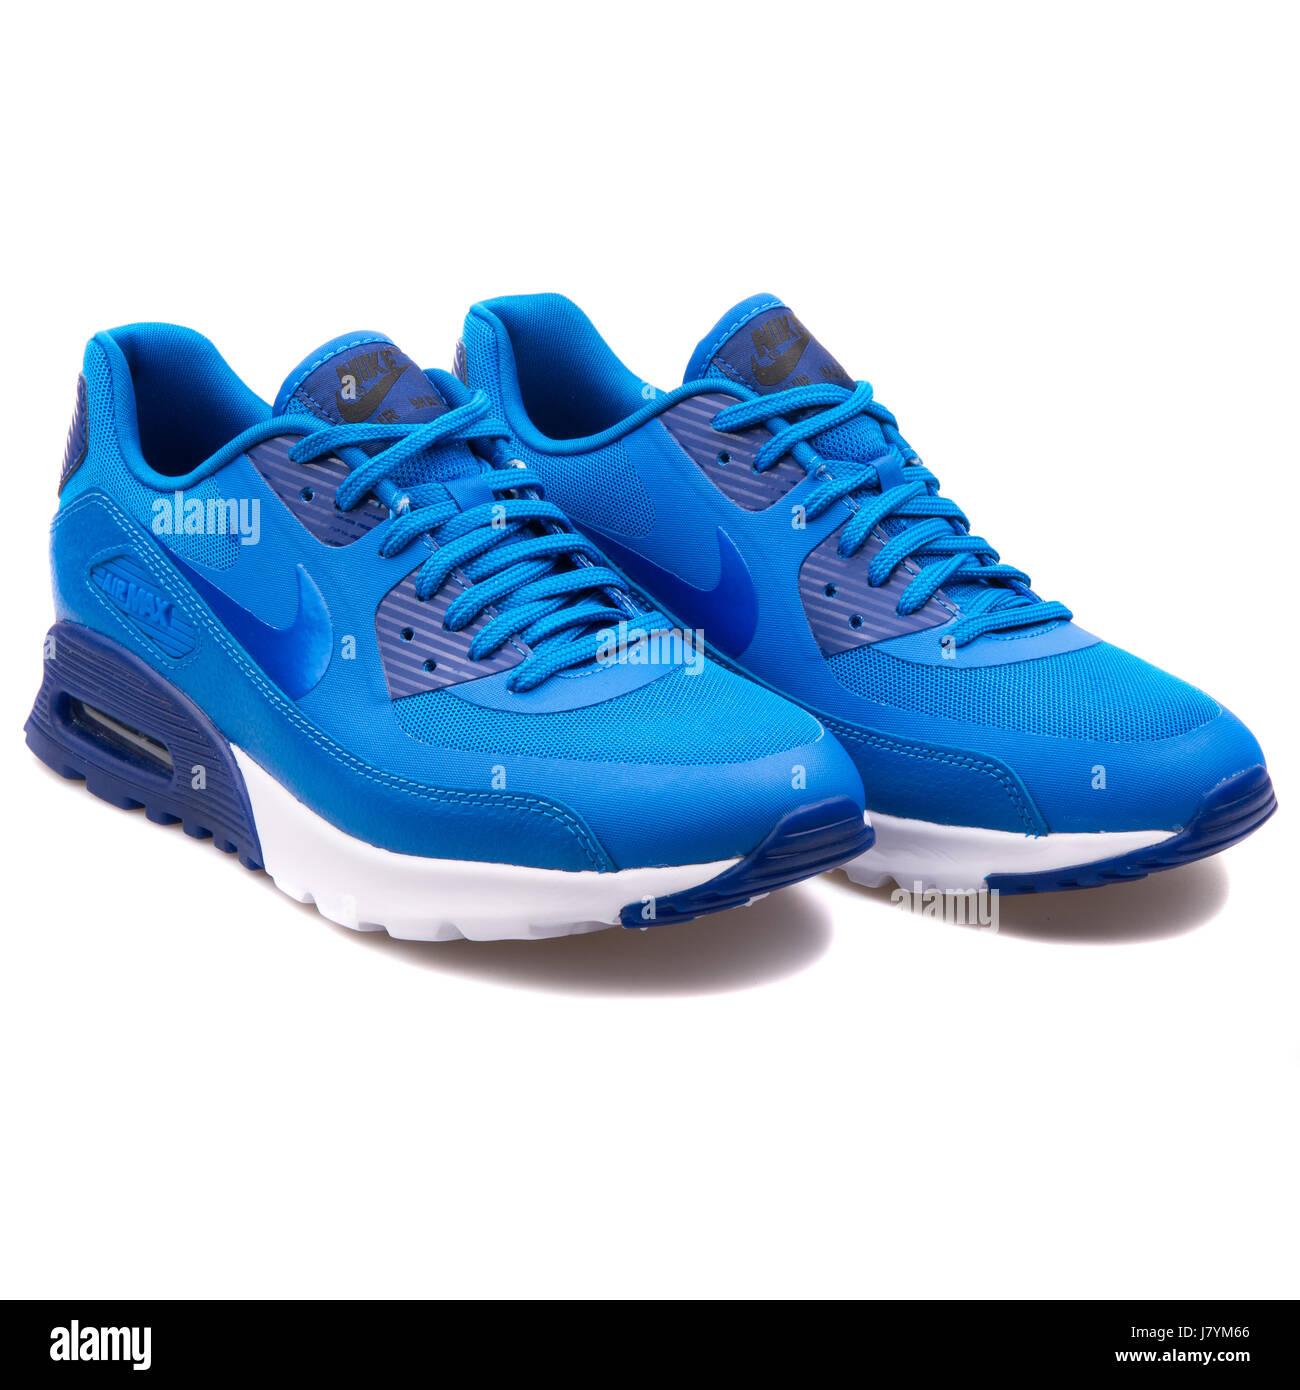 Nike Sportswear Frauen Air Max 90 Ultra Essential Blau